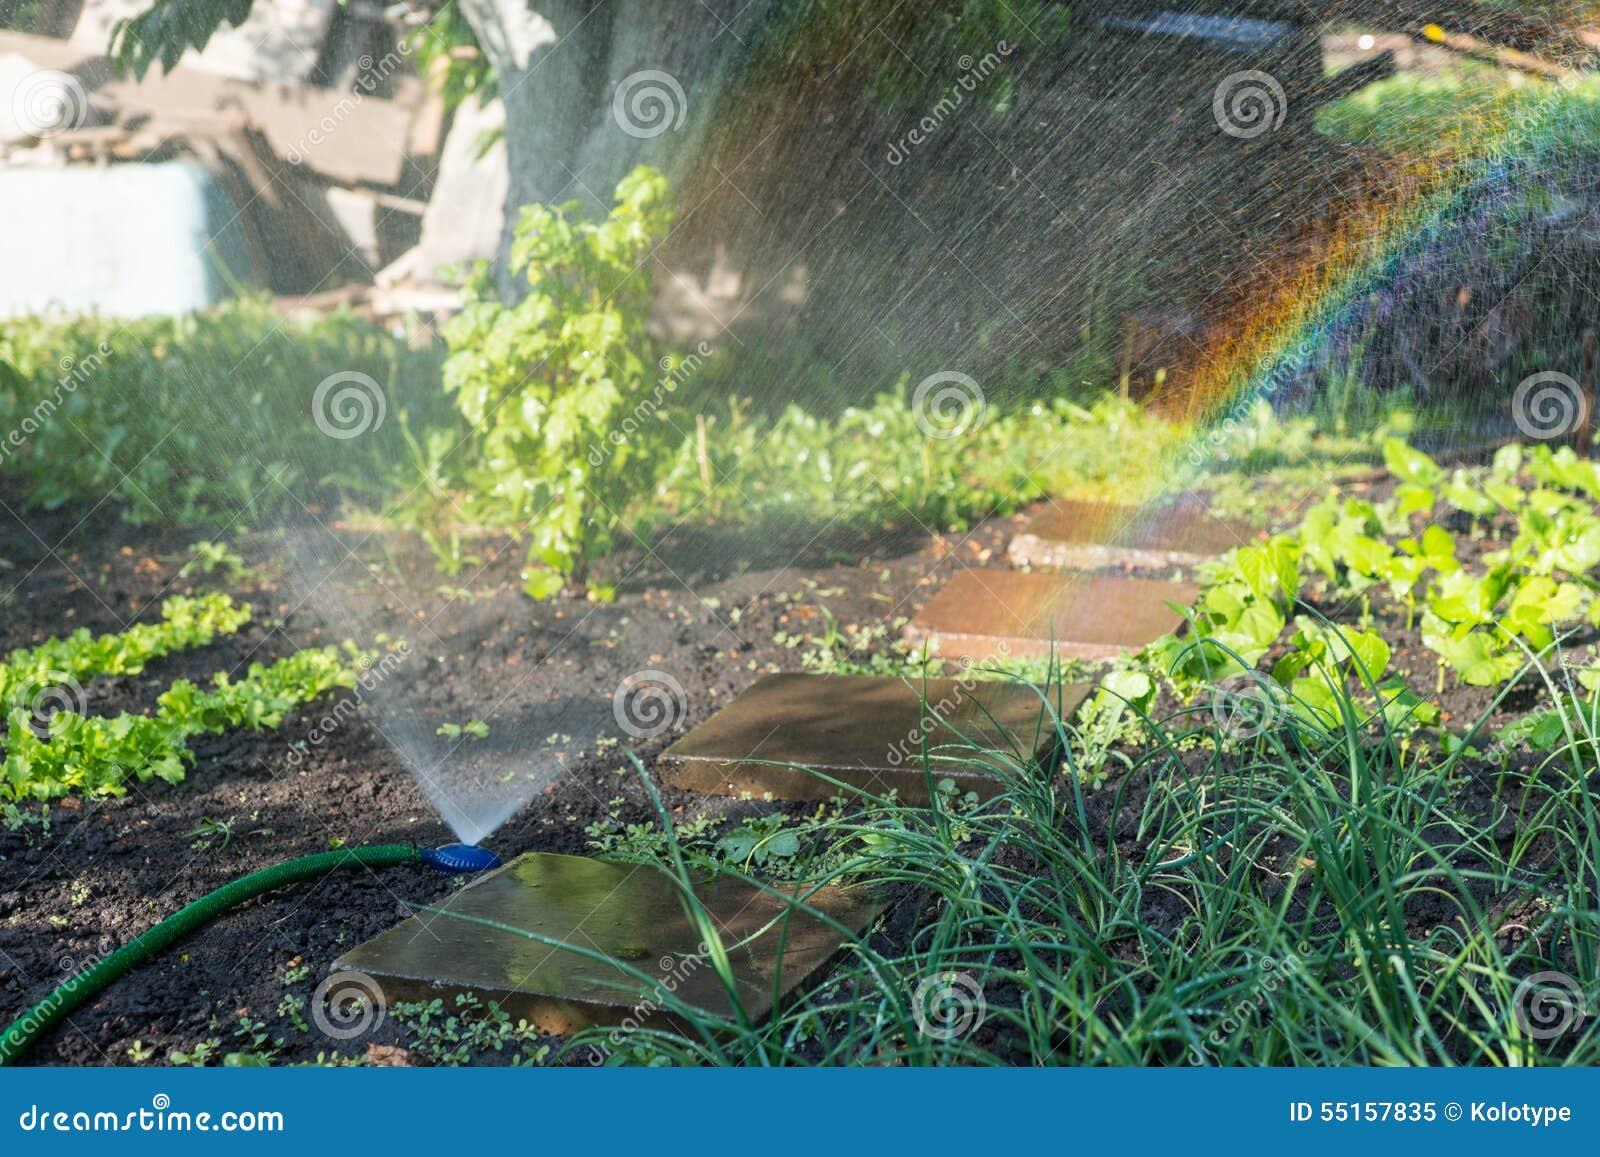 Irrigation Of Vegetables Stock Photography | CartoonDealer ...